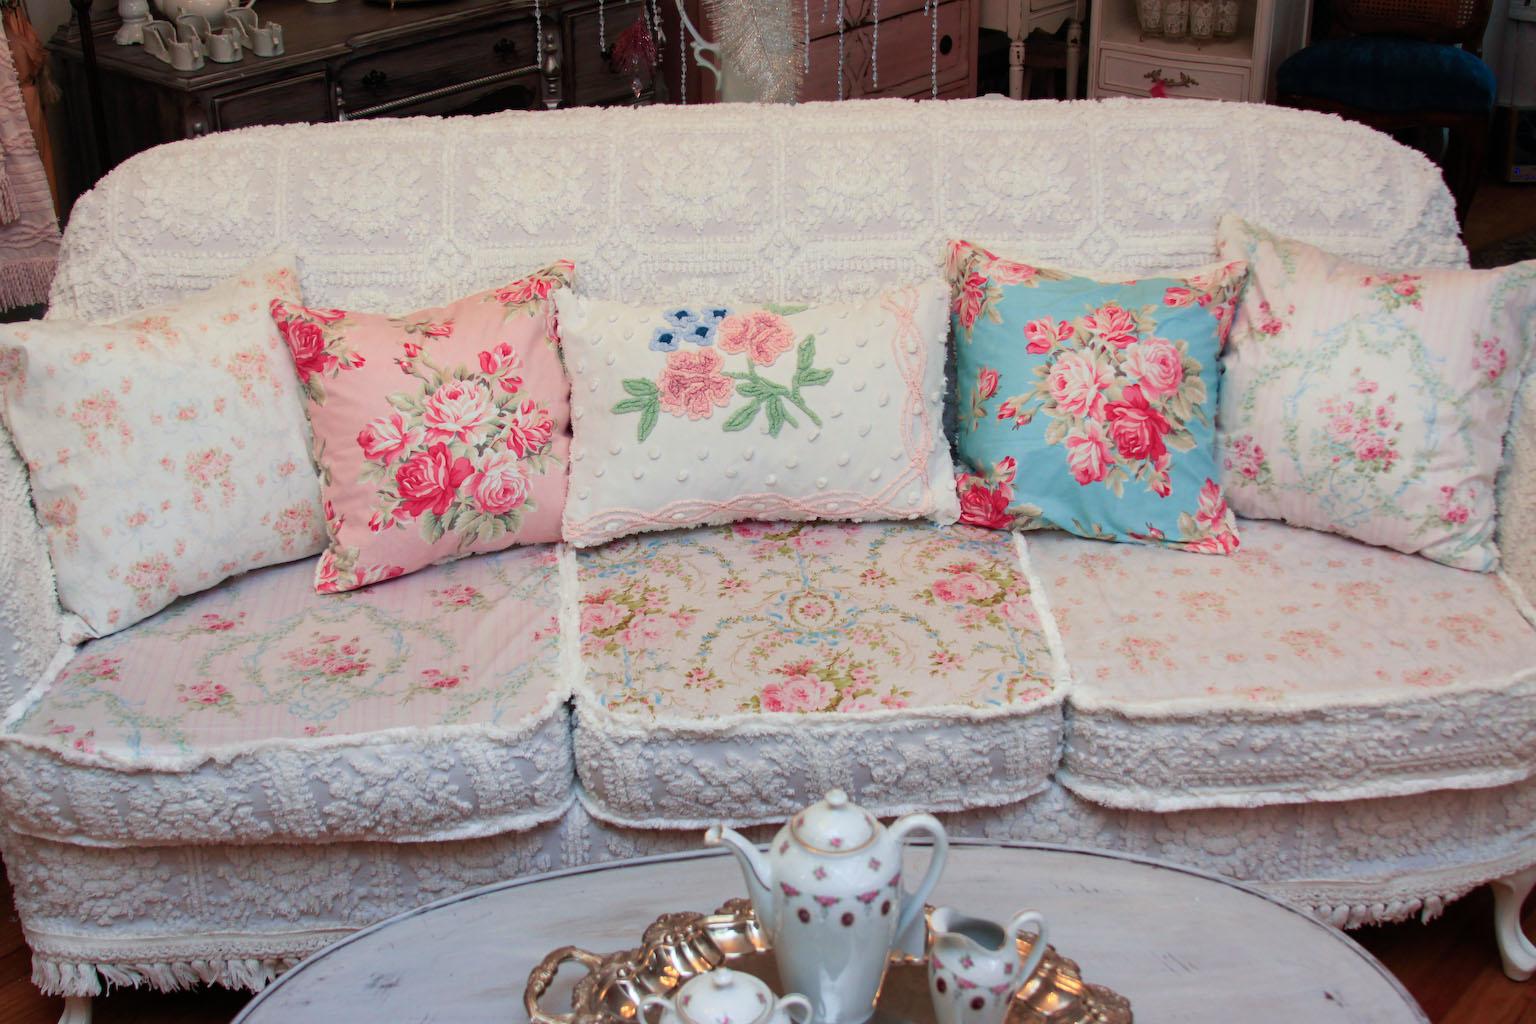 Vintage Chic Furniture Schenectady NY: OMG! Antique Sofa ...